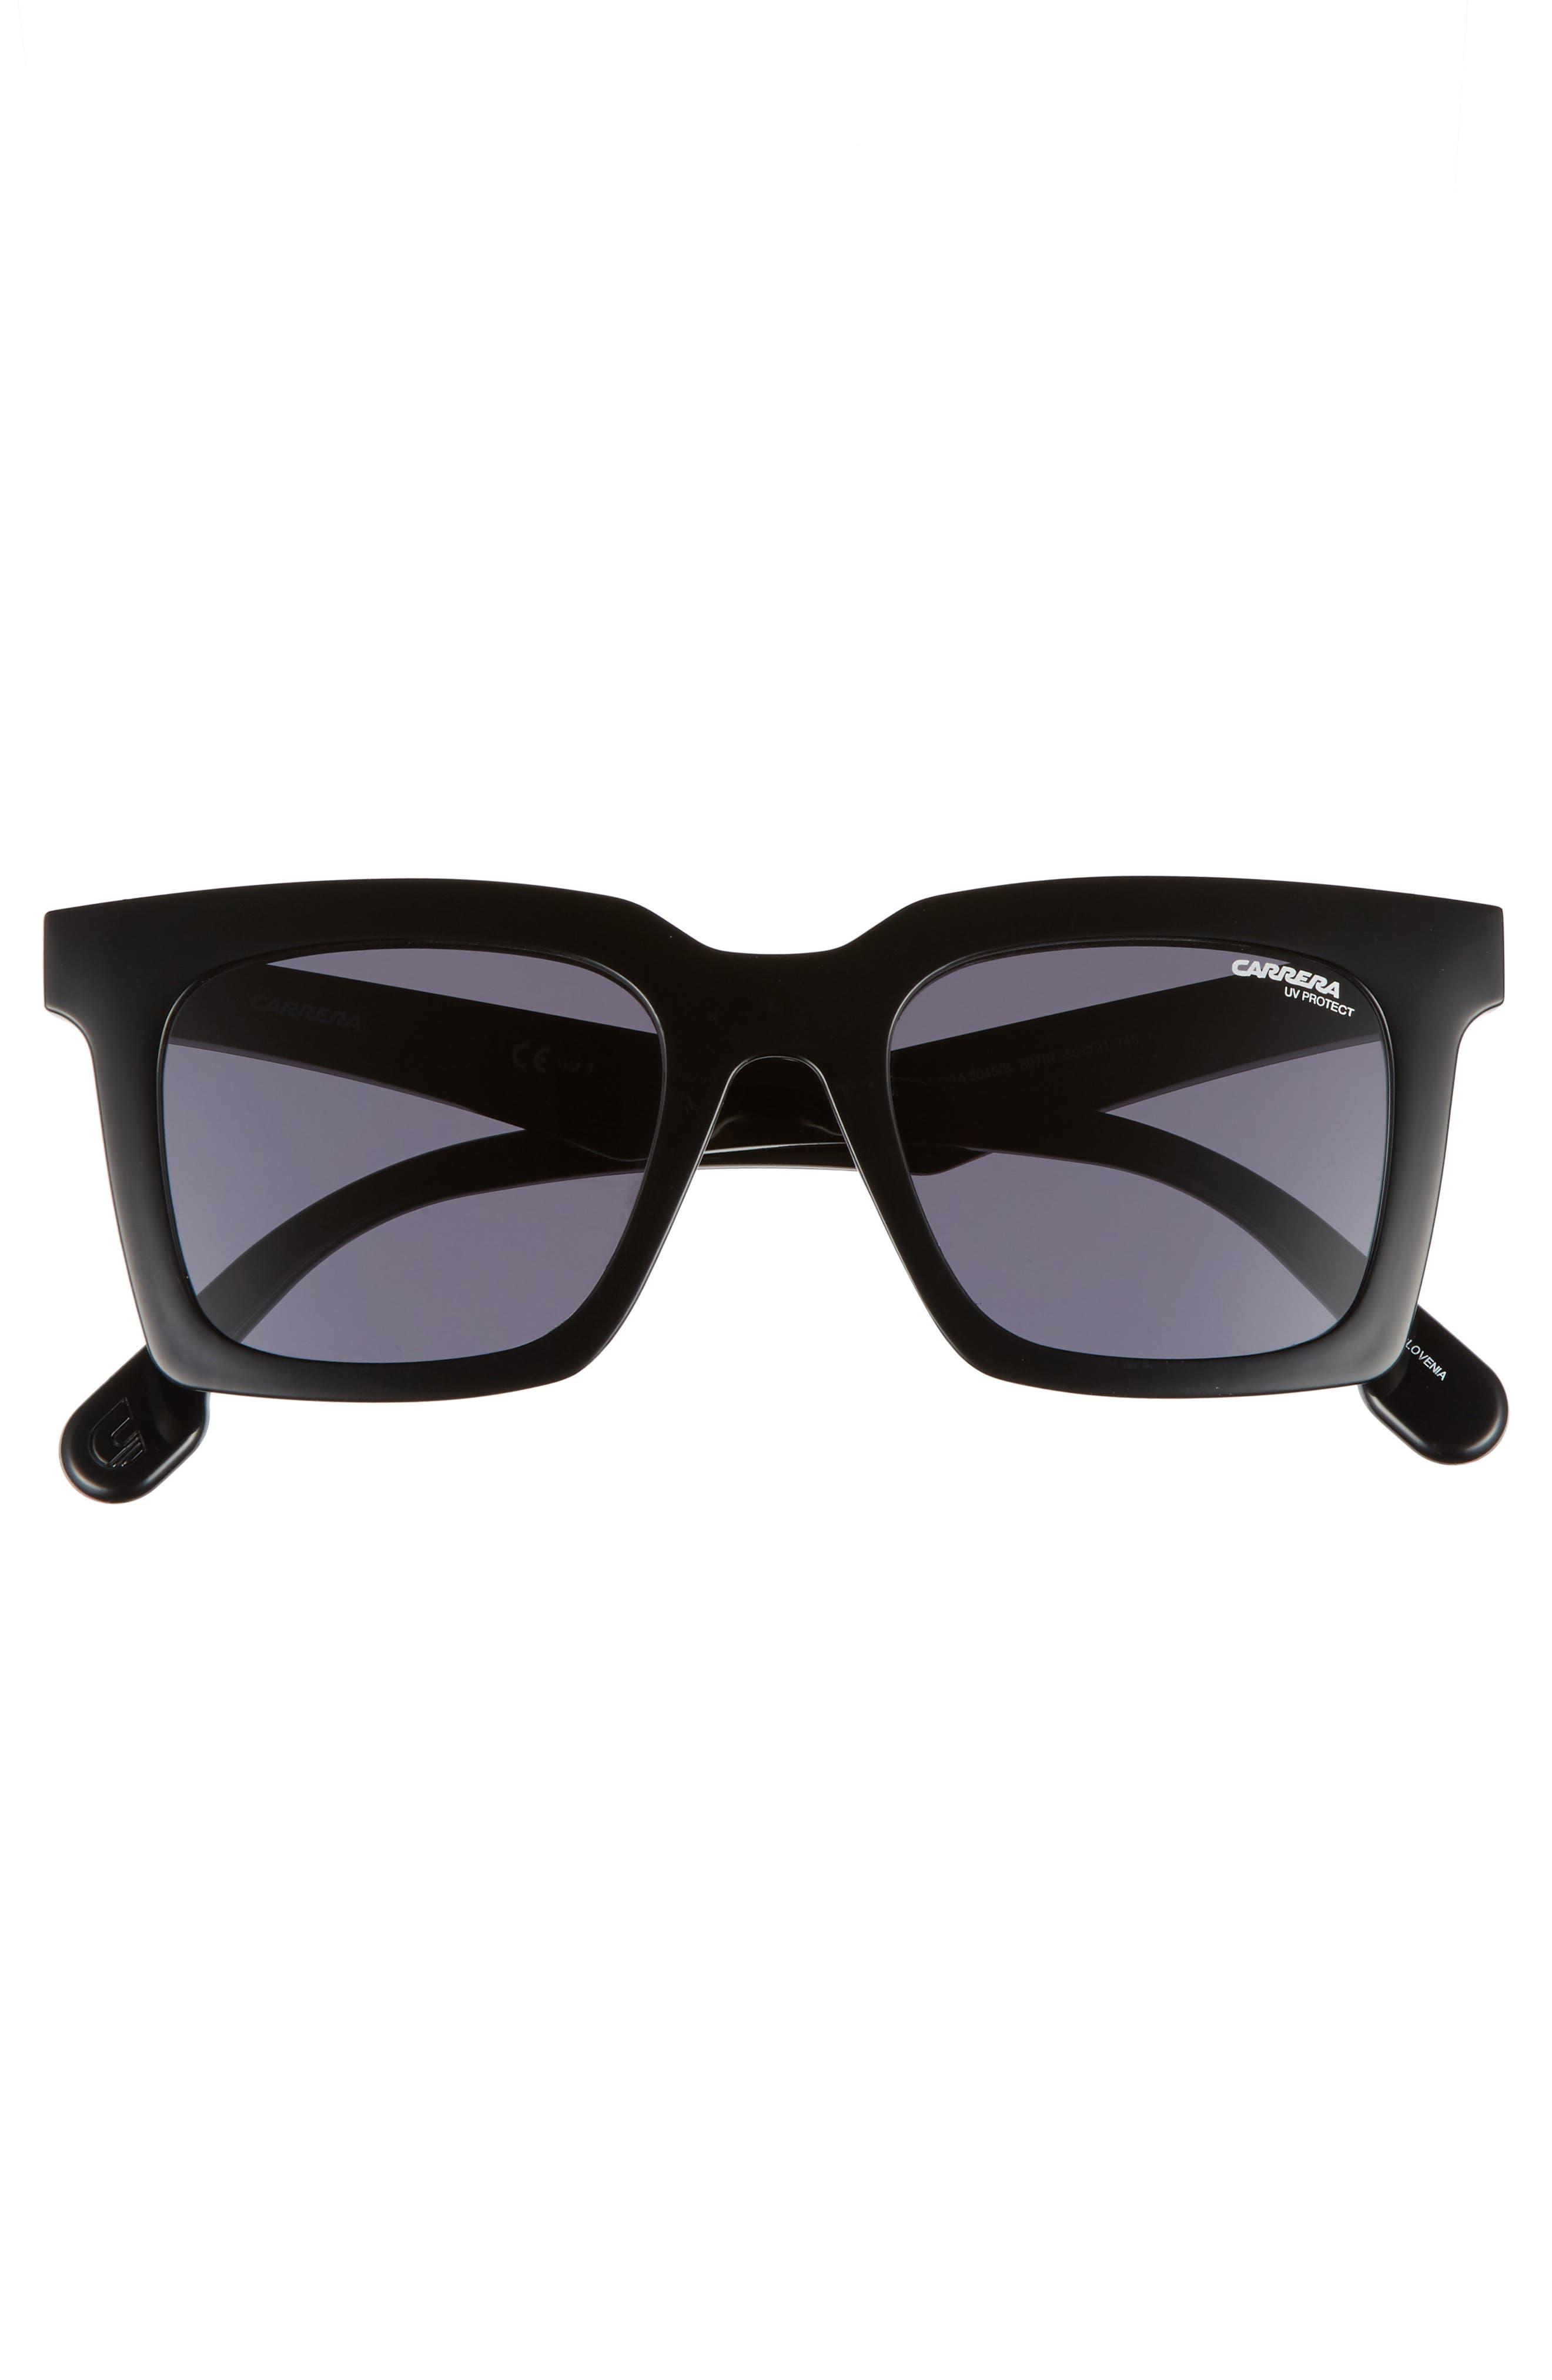 5045S 50mm Sunglasses,                             Alternate thumbnail 2, color,                             Black/ Gray Blue